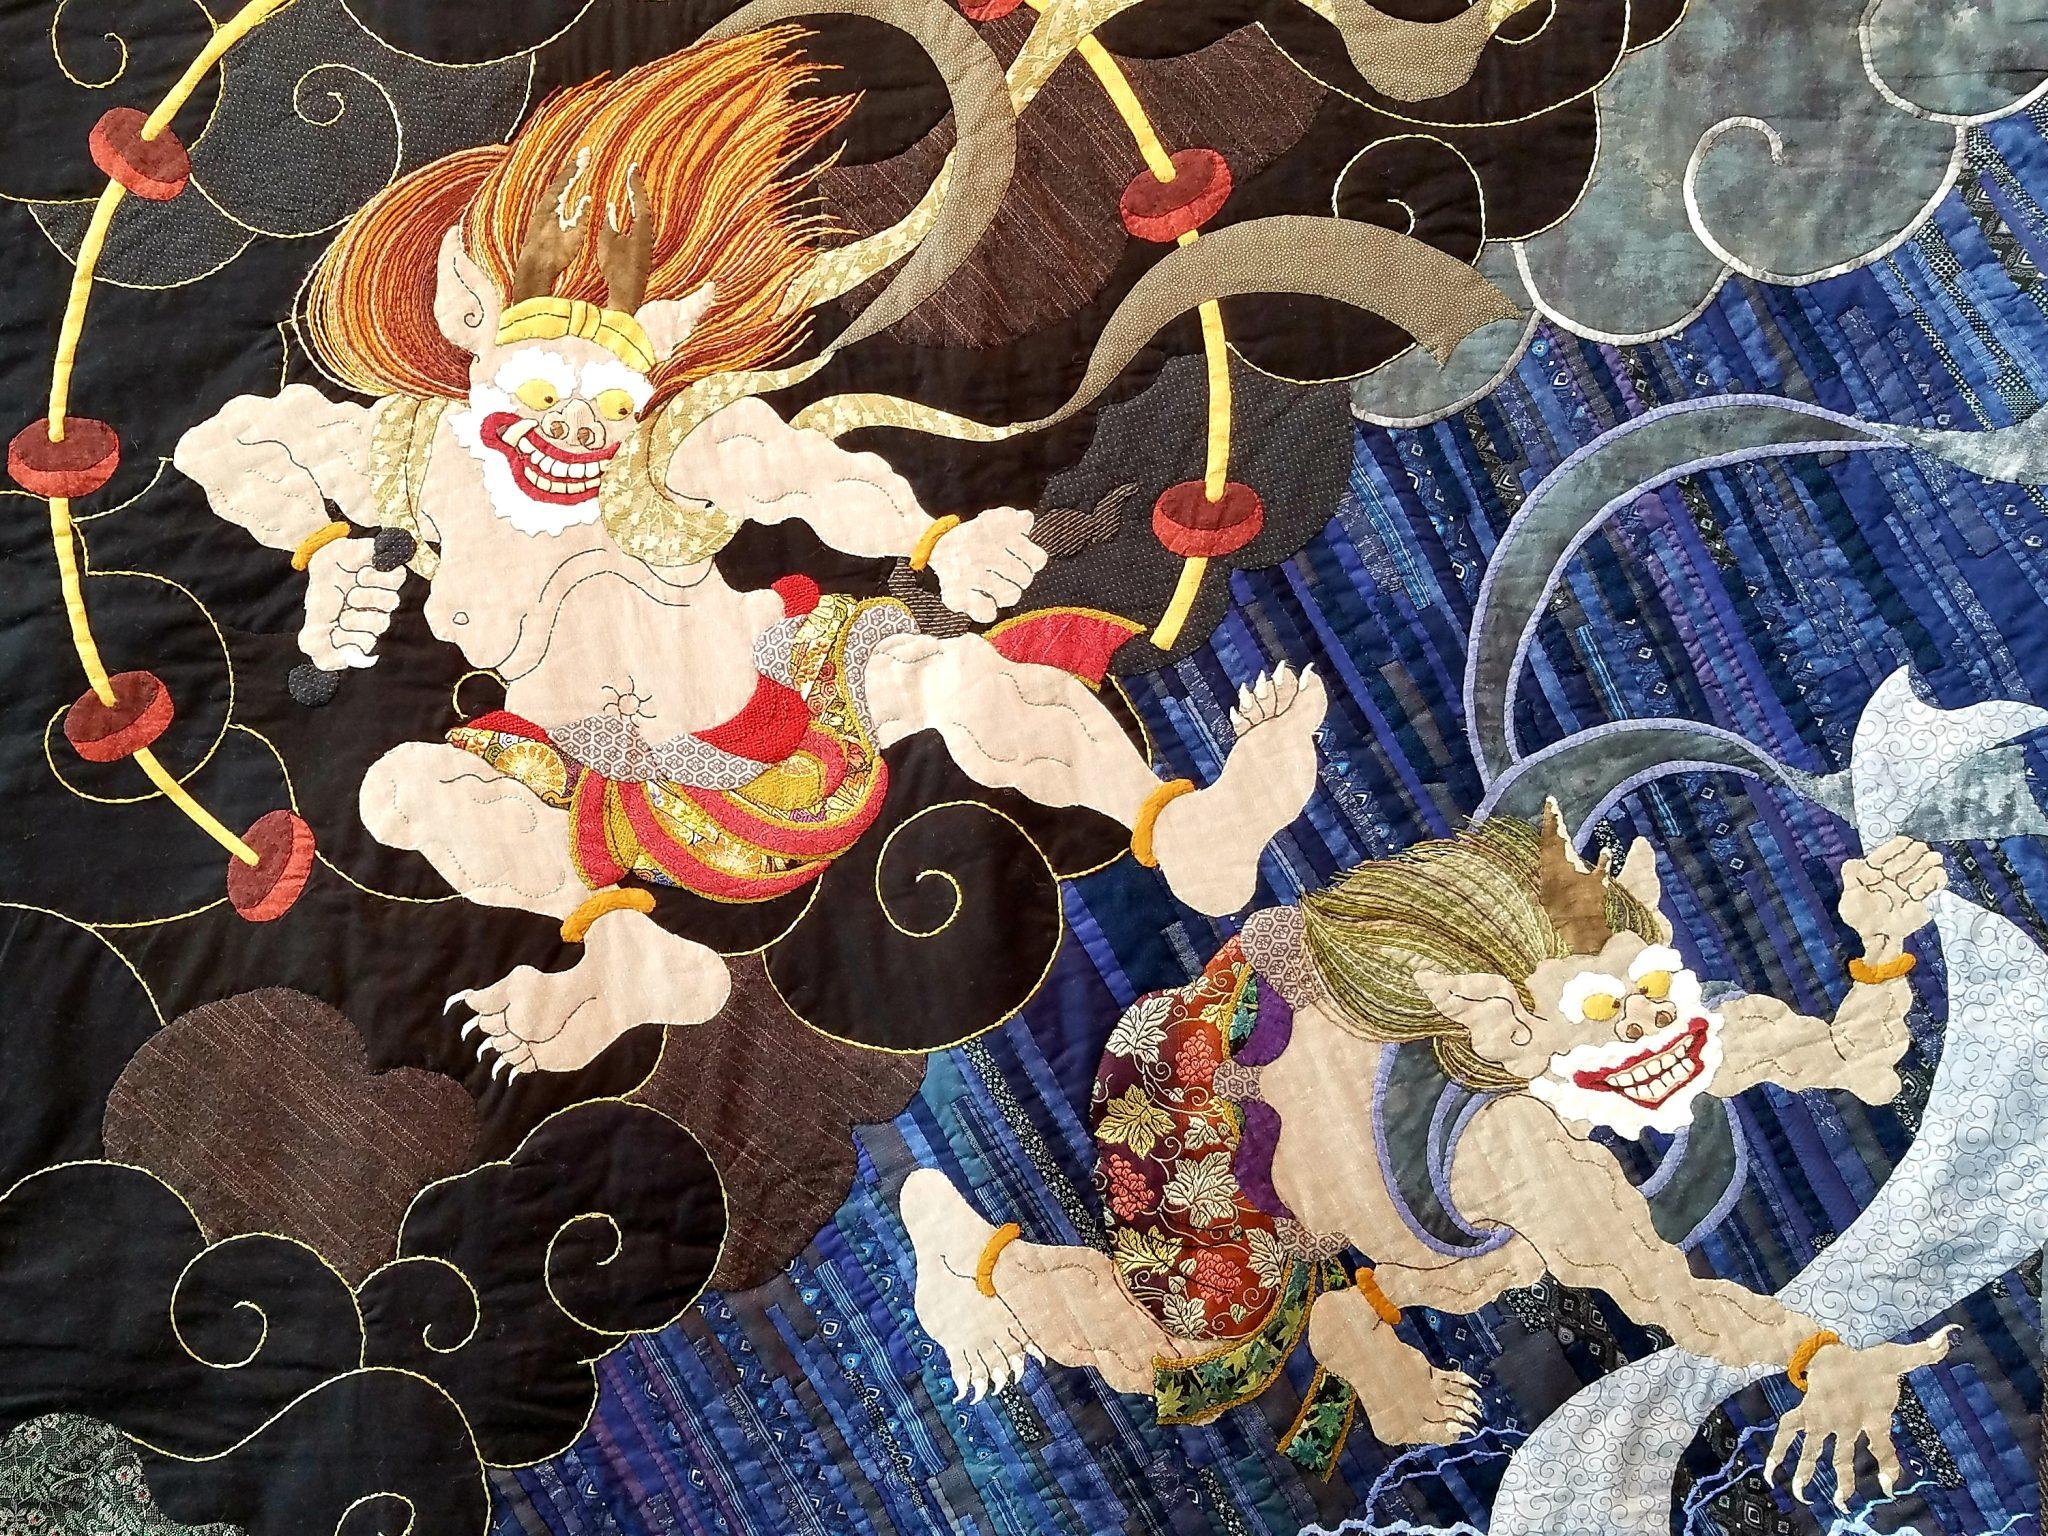 'Fujin・Raijin - Wing God and Thunder God' by Yoko Sekita from the 19th Tokyo International Great Quilt Festival